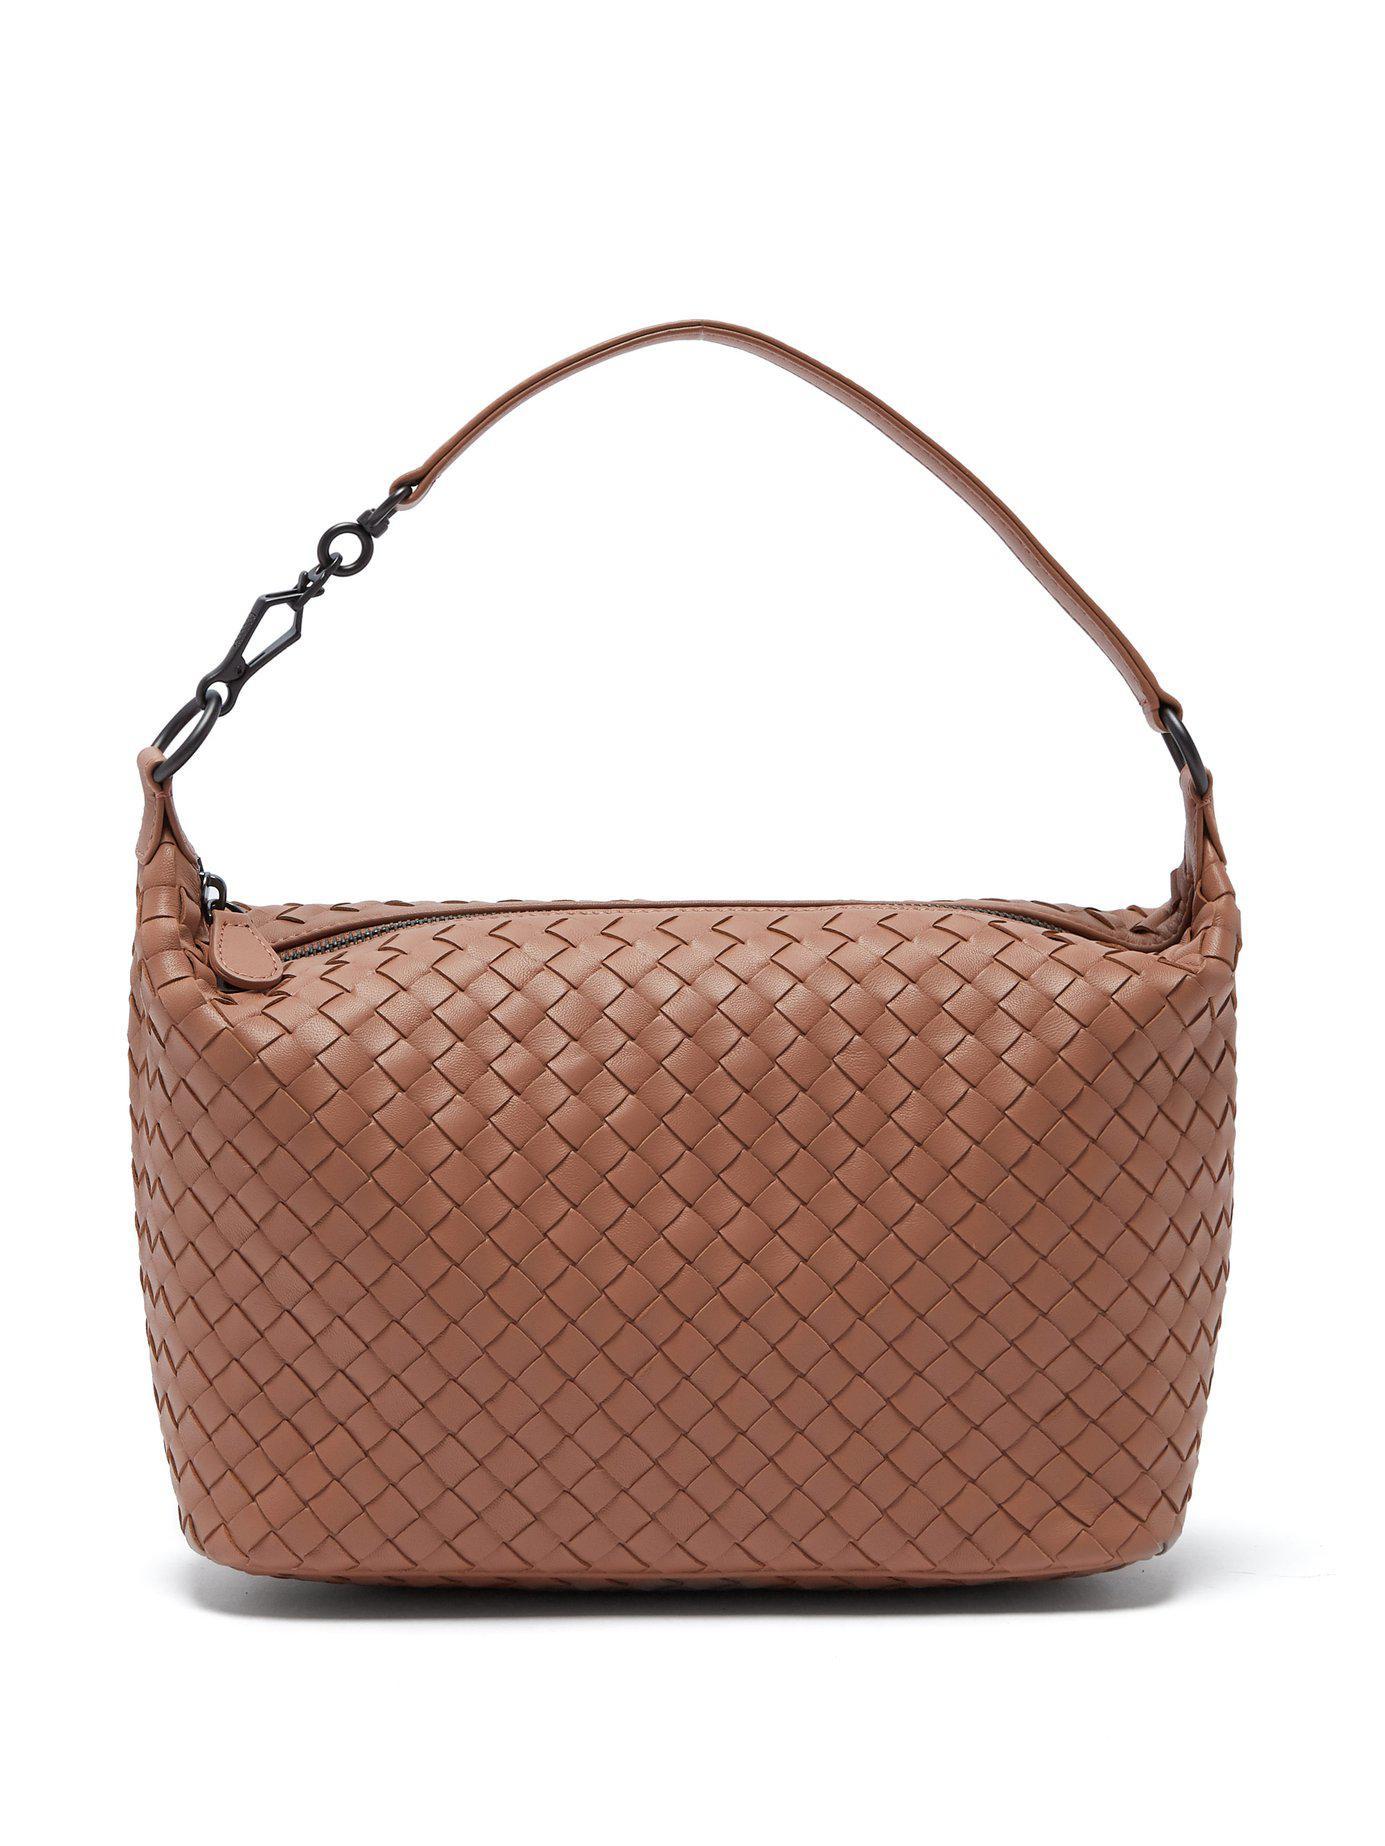 Bottega Veneta Ciambrino Intrecciato Leather Shoulder Bag - Lyst cdb3bde90a940